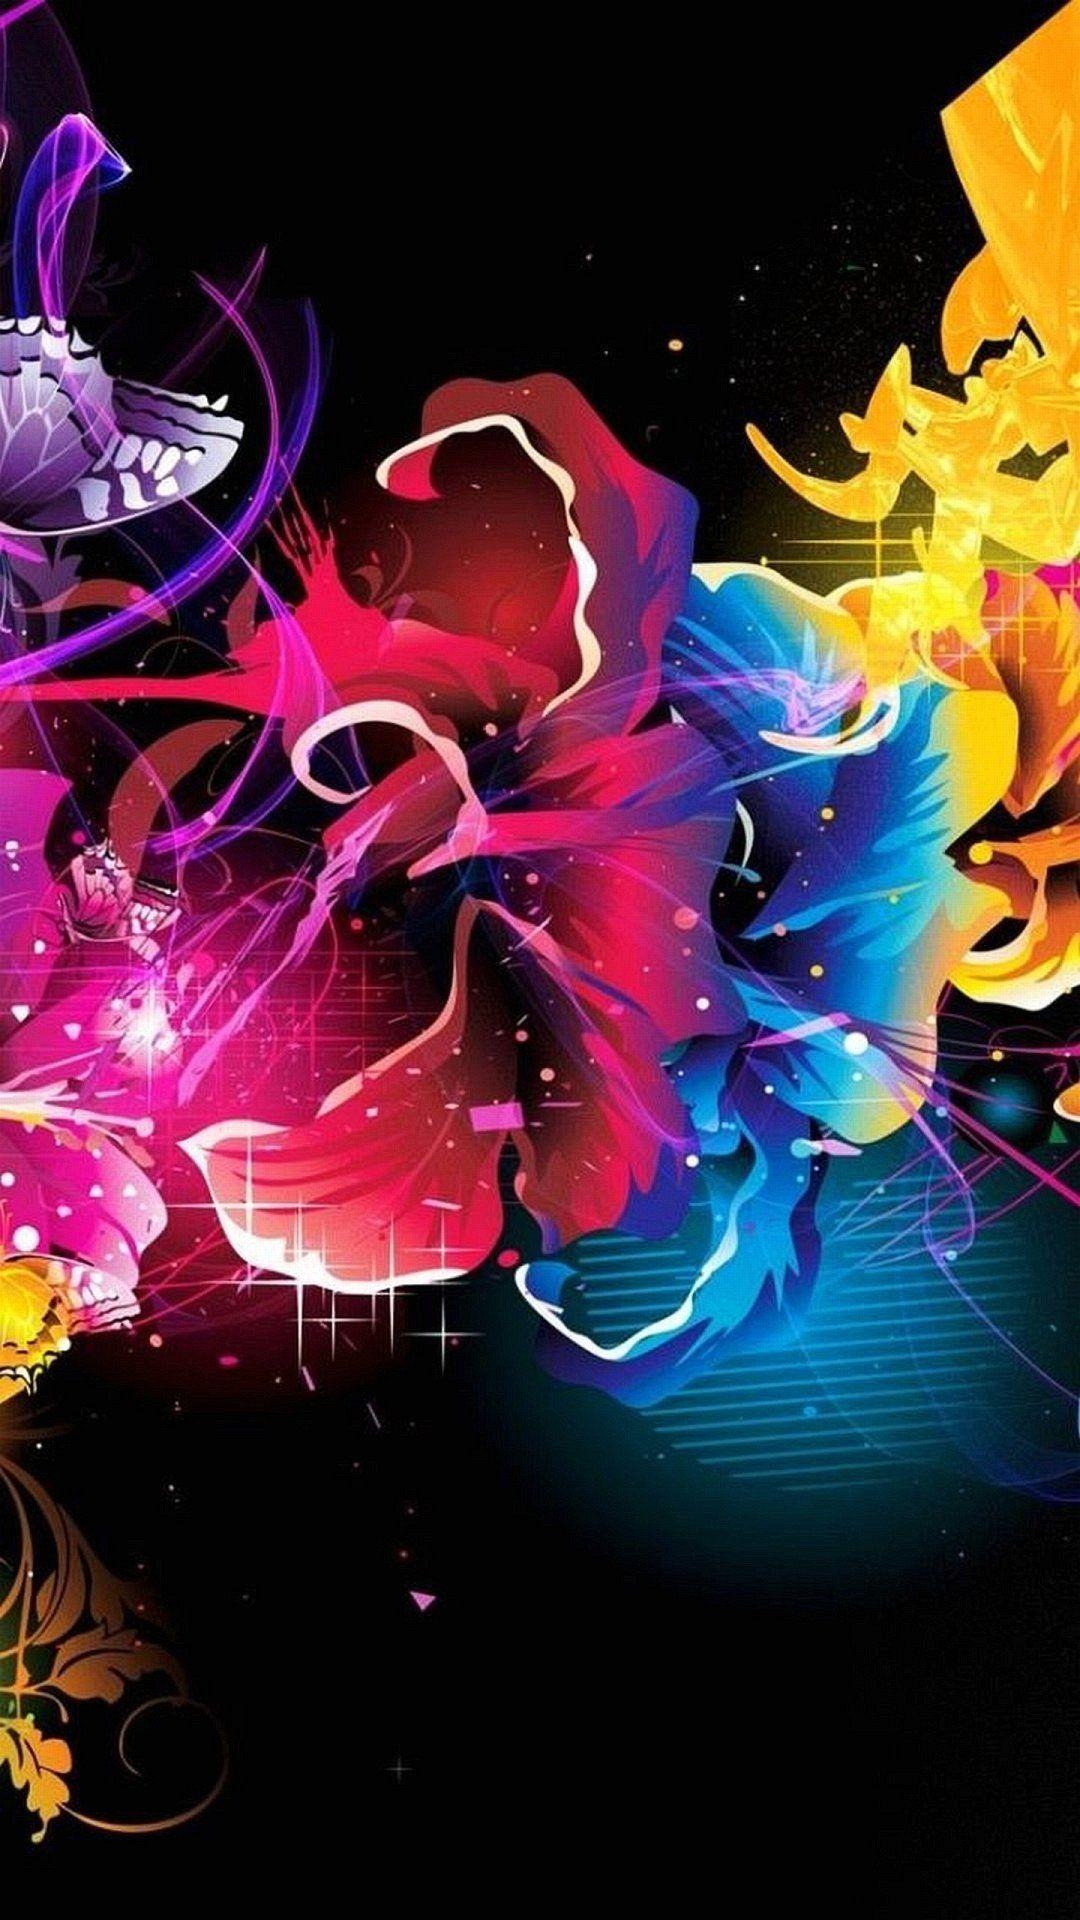 2018 Iphone Wallpapers صور خلفيات ايفون Hd روعه Tecnologis Beautiful Wallpapers For Iphone Iphone Wallpaper Smartphone Wallpaper